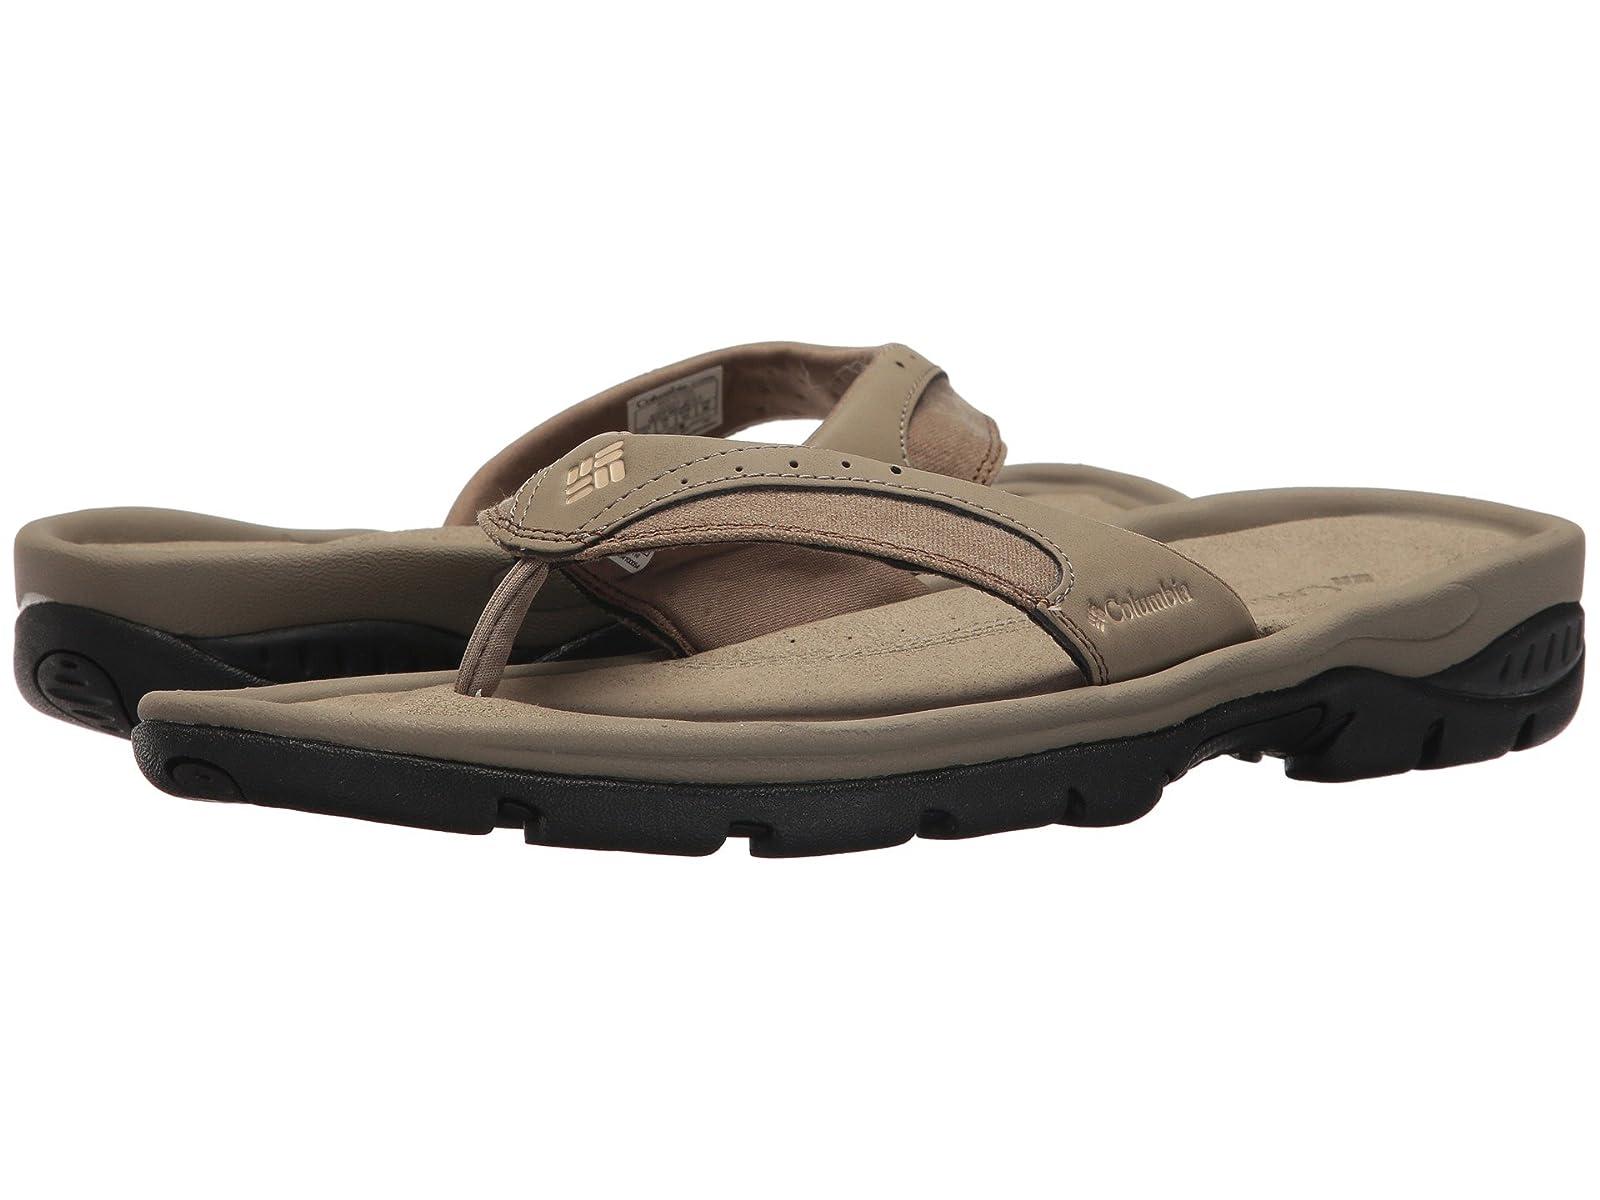 Columbia Tango Thong IIIComfortable and distinctive shoes